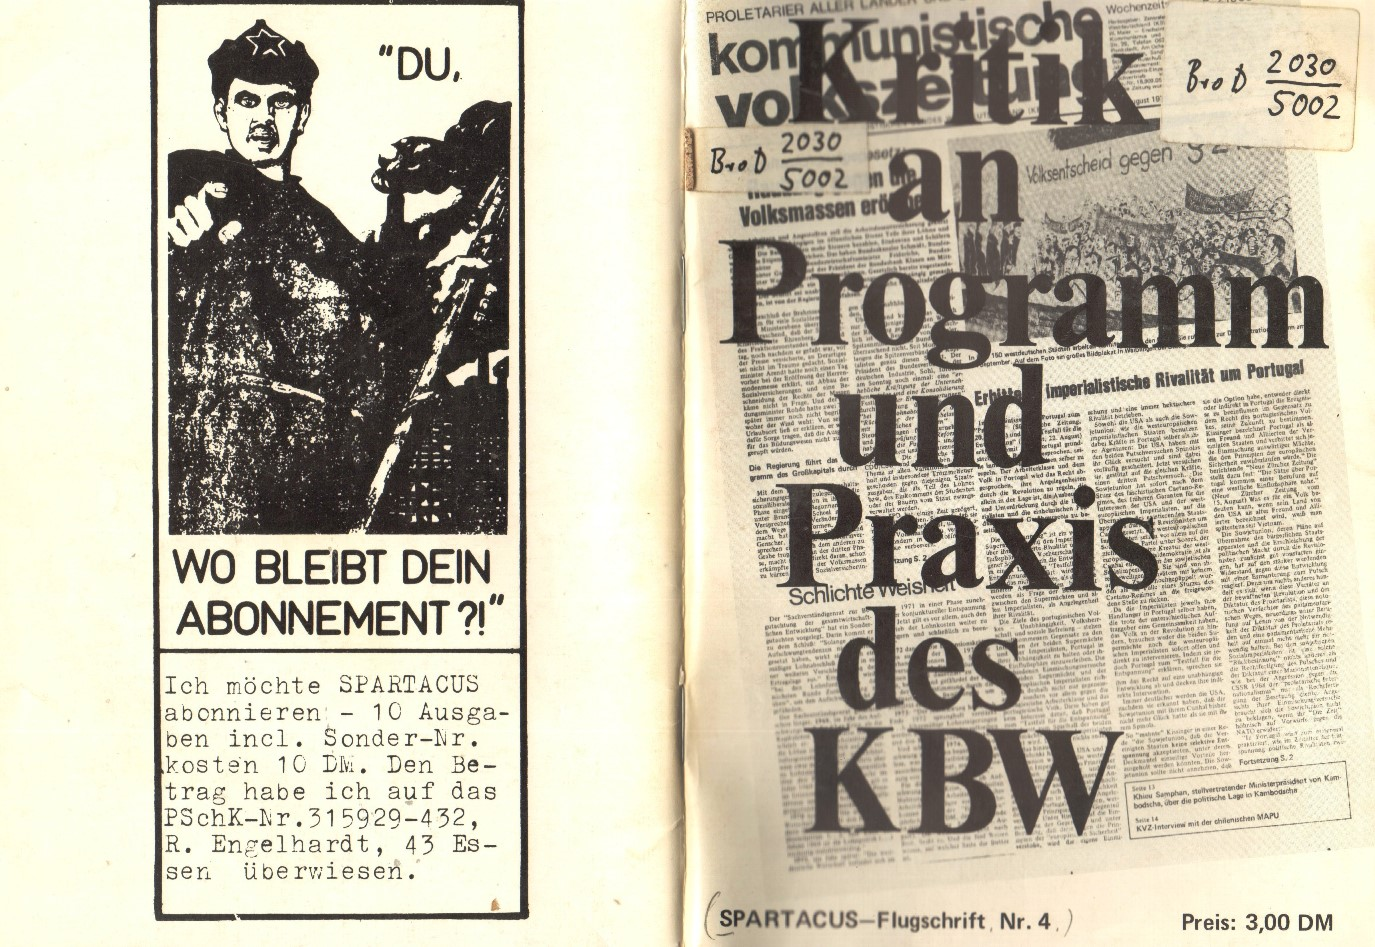 Spartacus_1975_Kritik_des_KBW_01